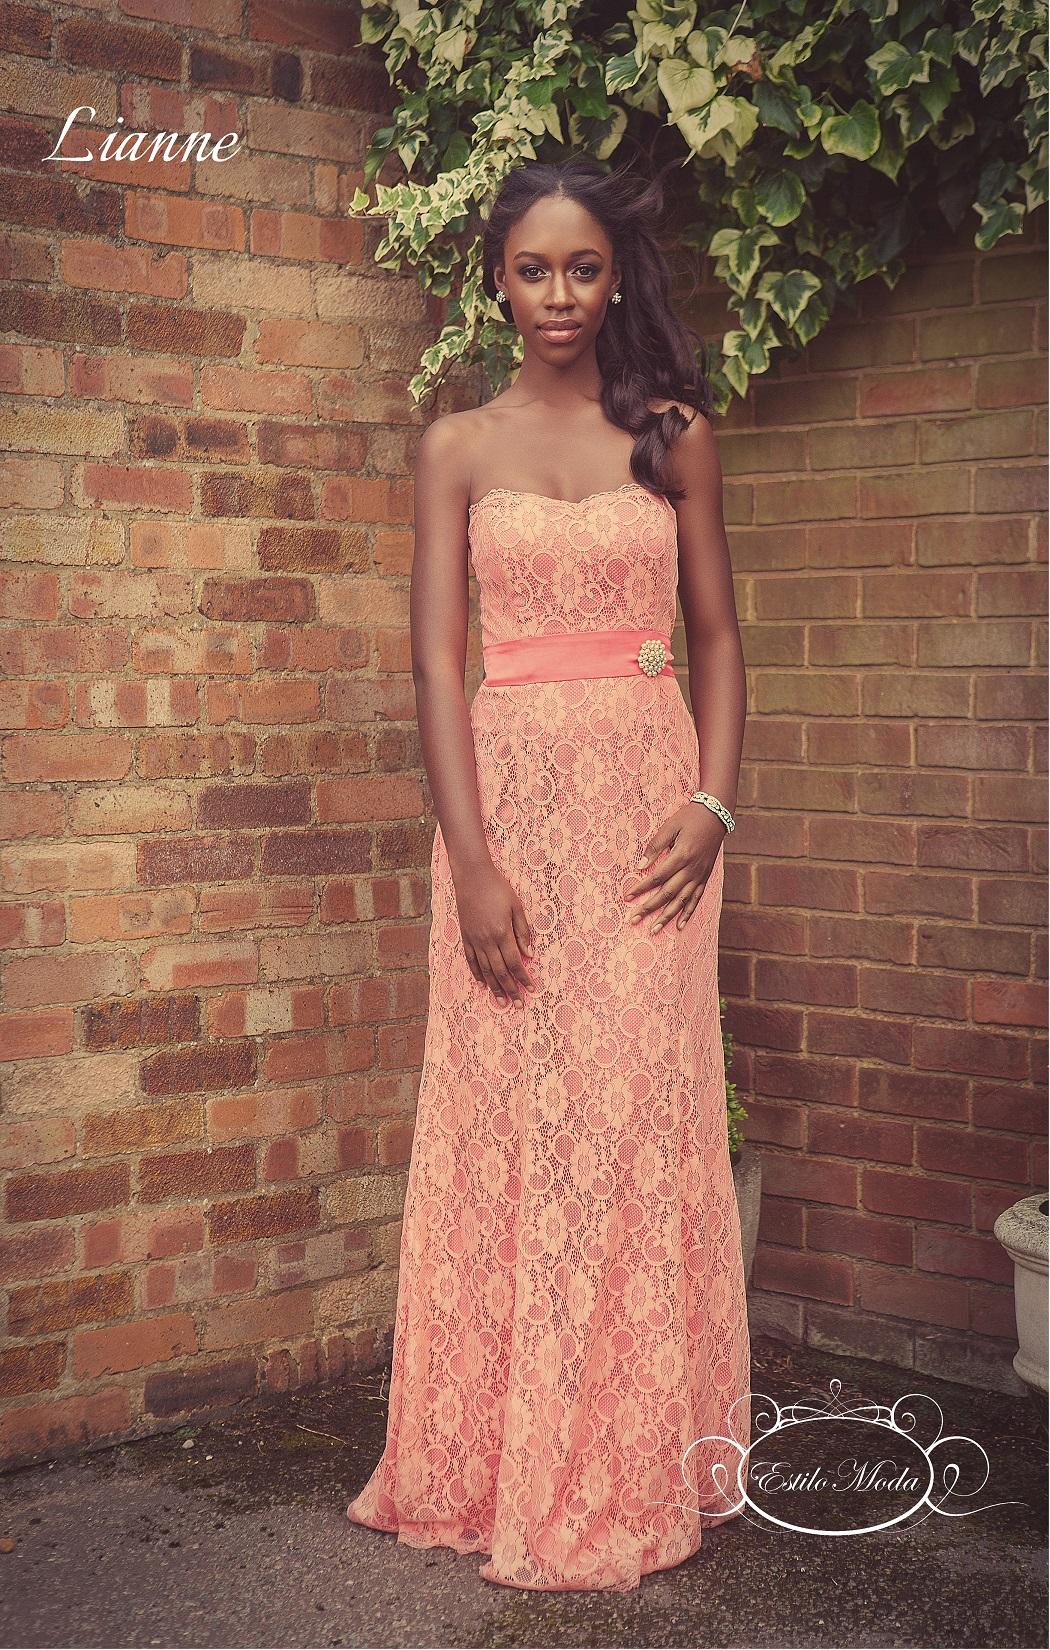 Prom dresses uk milton keynes